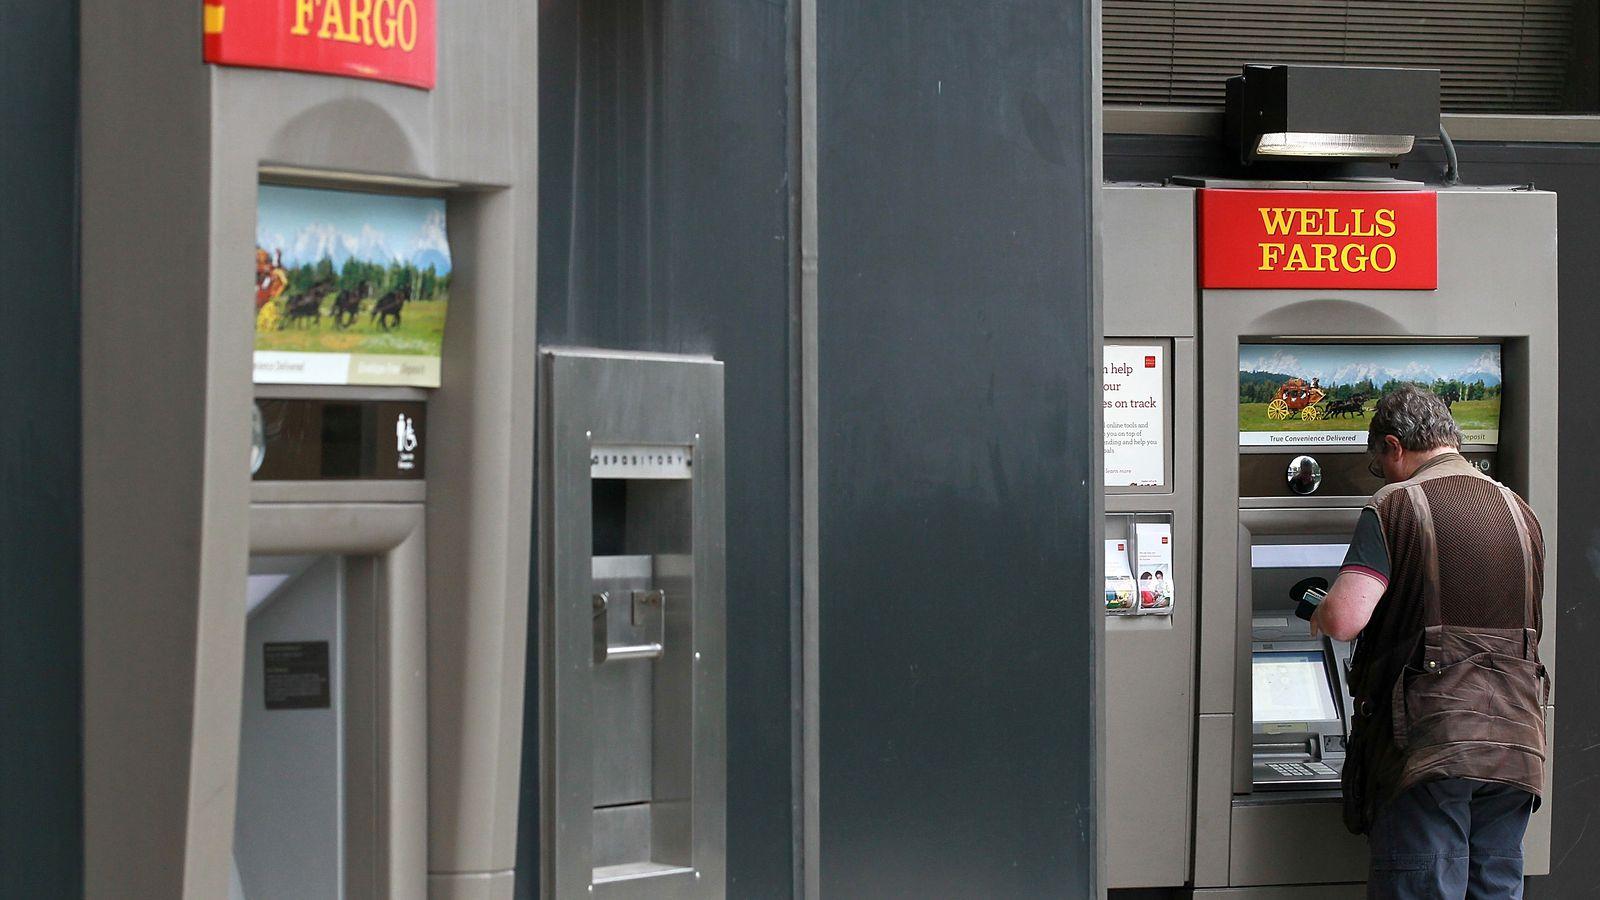 Wells Fargo will Now Let Customers Withdraw Money Using their Smartphones